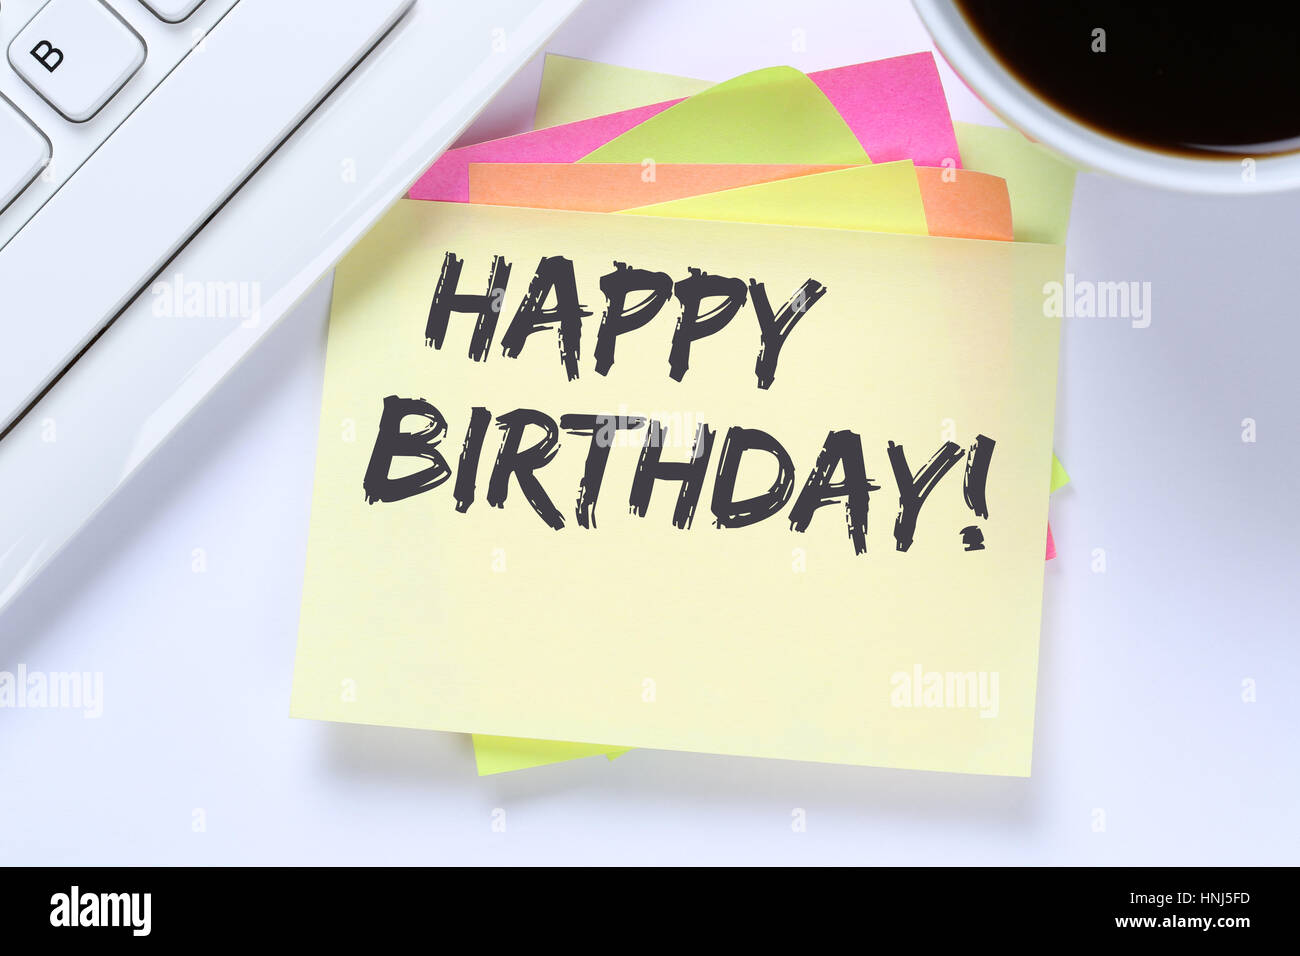 Happy Birthday greetings celebration business desk computer keyboard - Stock Image